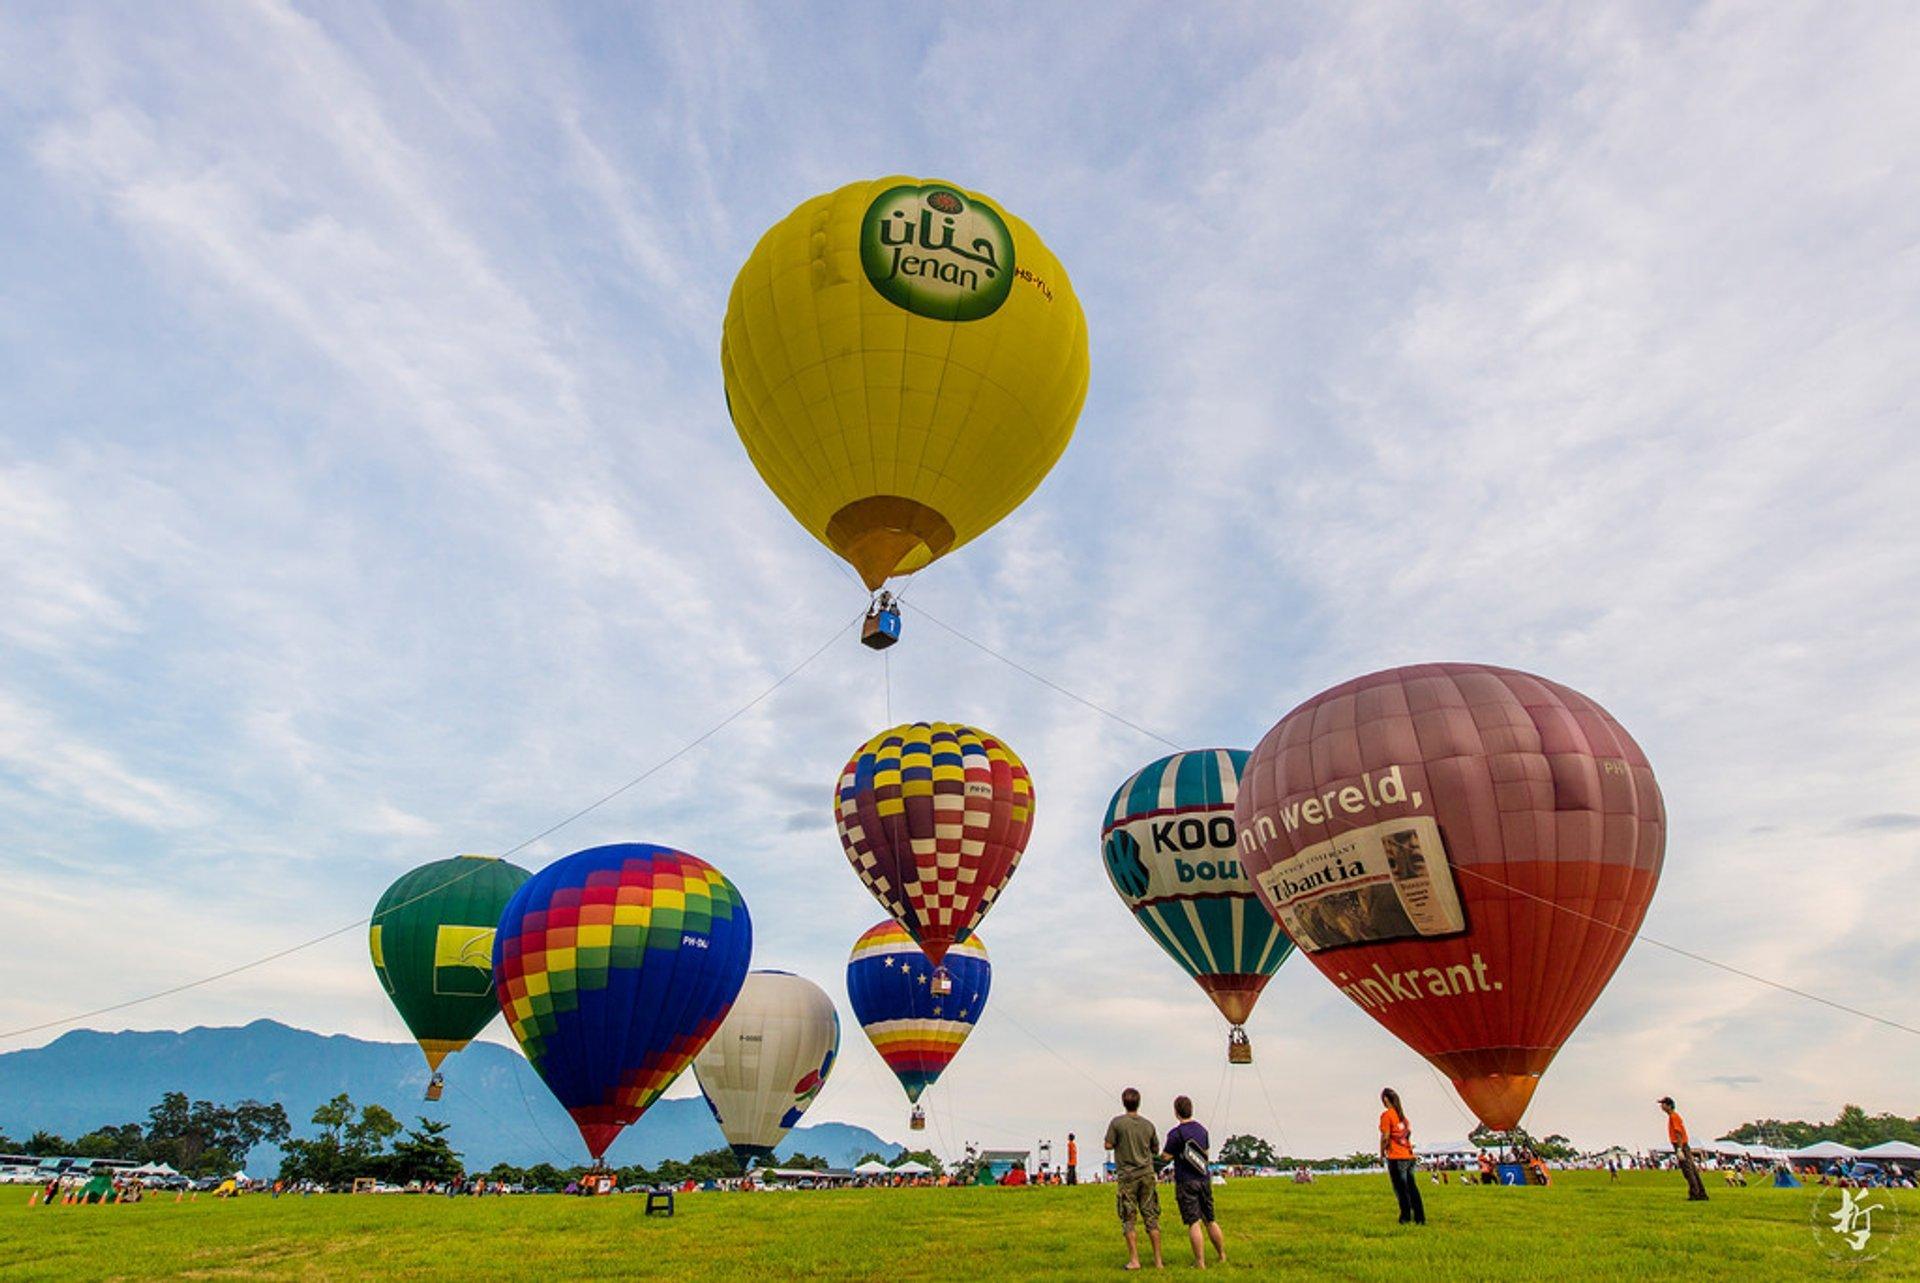 Taiwan Balloon Festival in Taiwan - Best Season